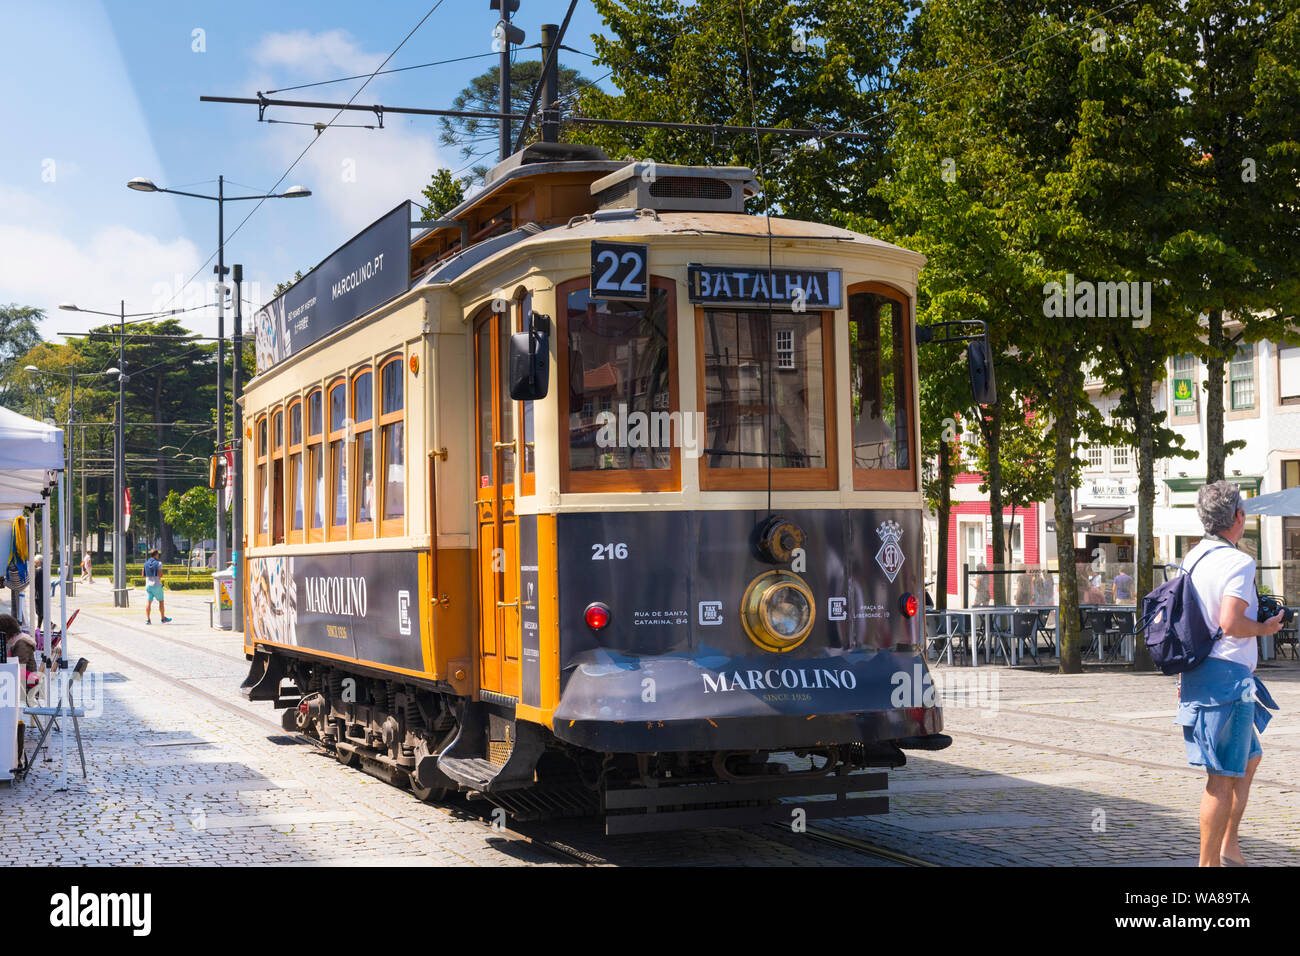 Portugal Oporto Porto old No 22 tram streetcar to Batalha tramlines rails street scene wooden doors window frames trees cafe Stock Photo